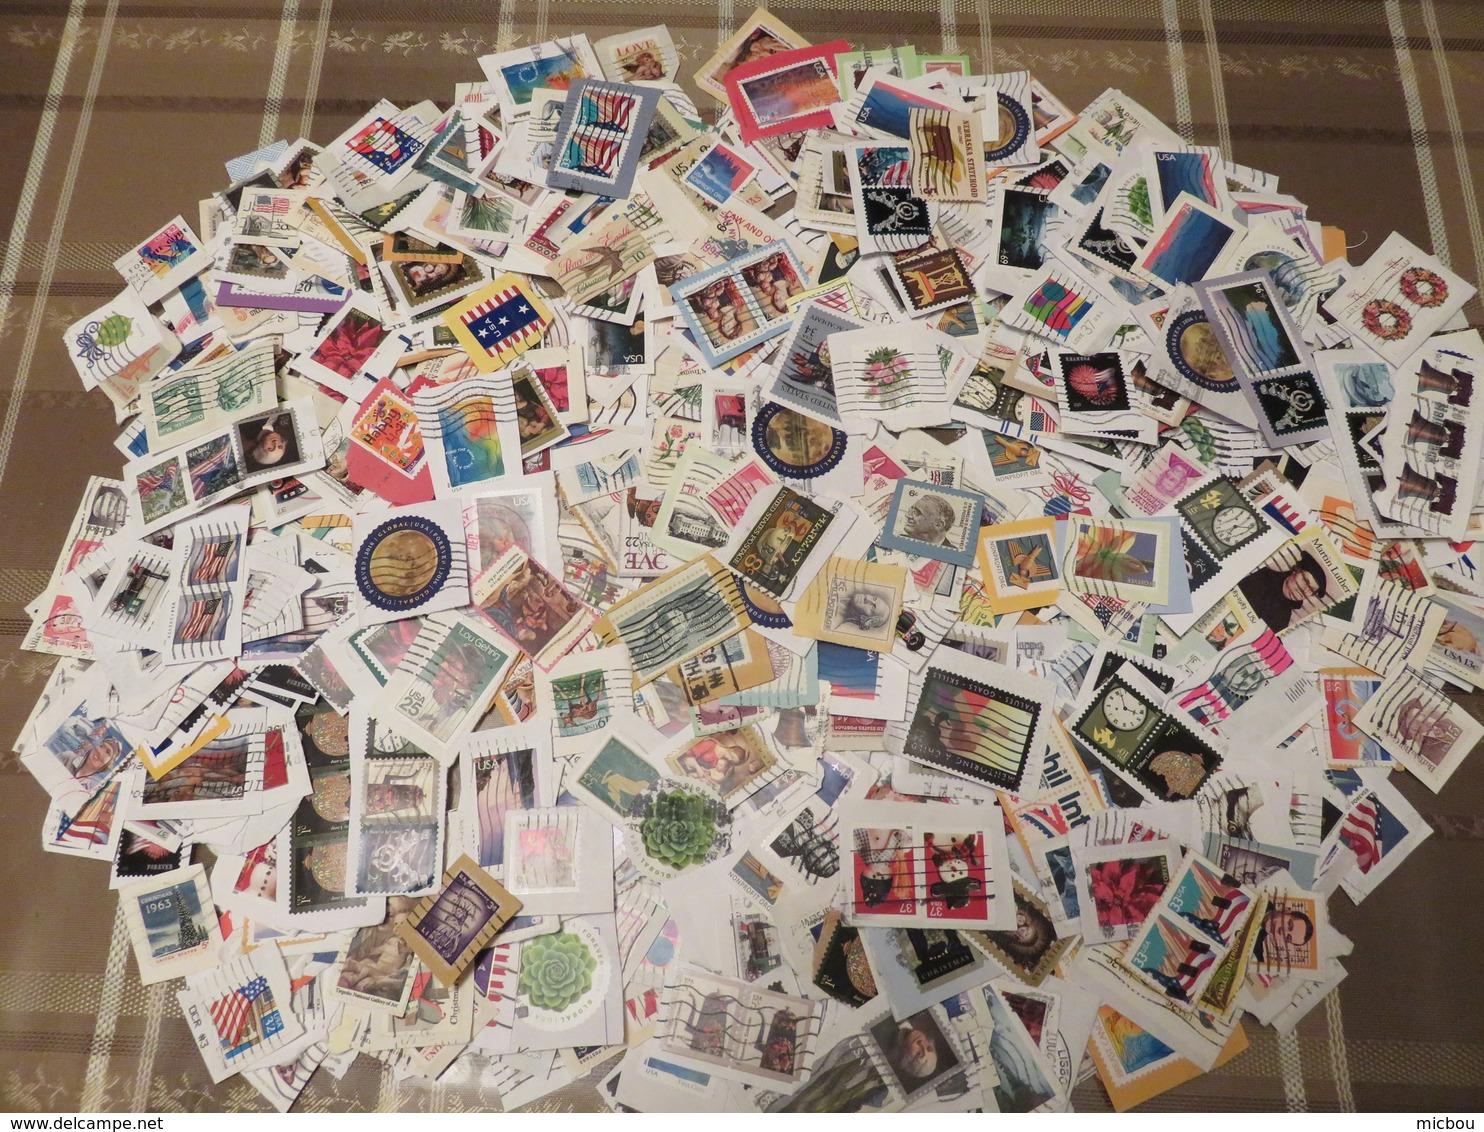 ##USA3, USA, Vrac, AUBAINE, DEAL, 180g, Environ 1000 Timbres, Around 1000 Stamps, Diversifié, Diversified - Timbres